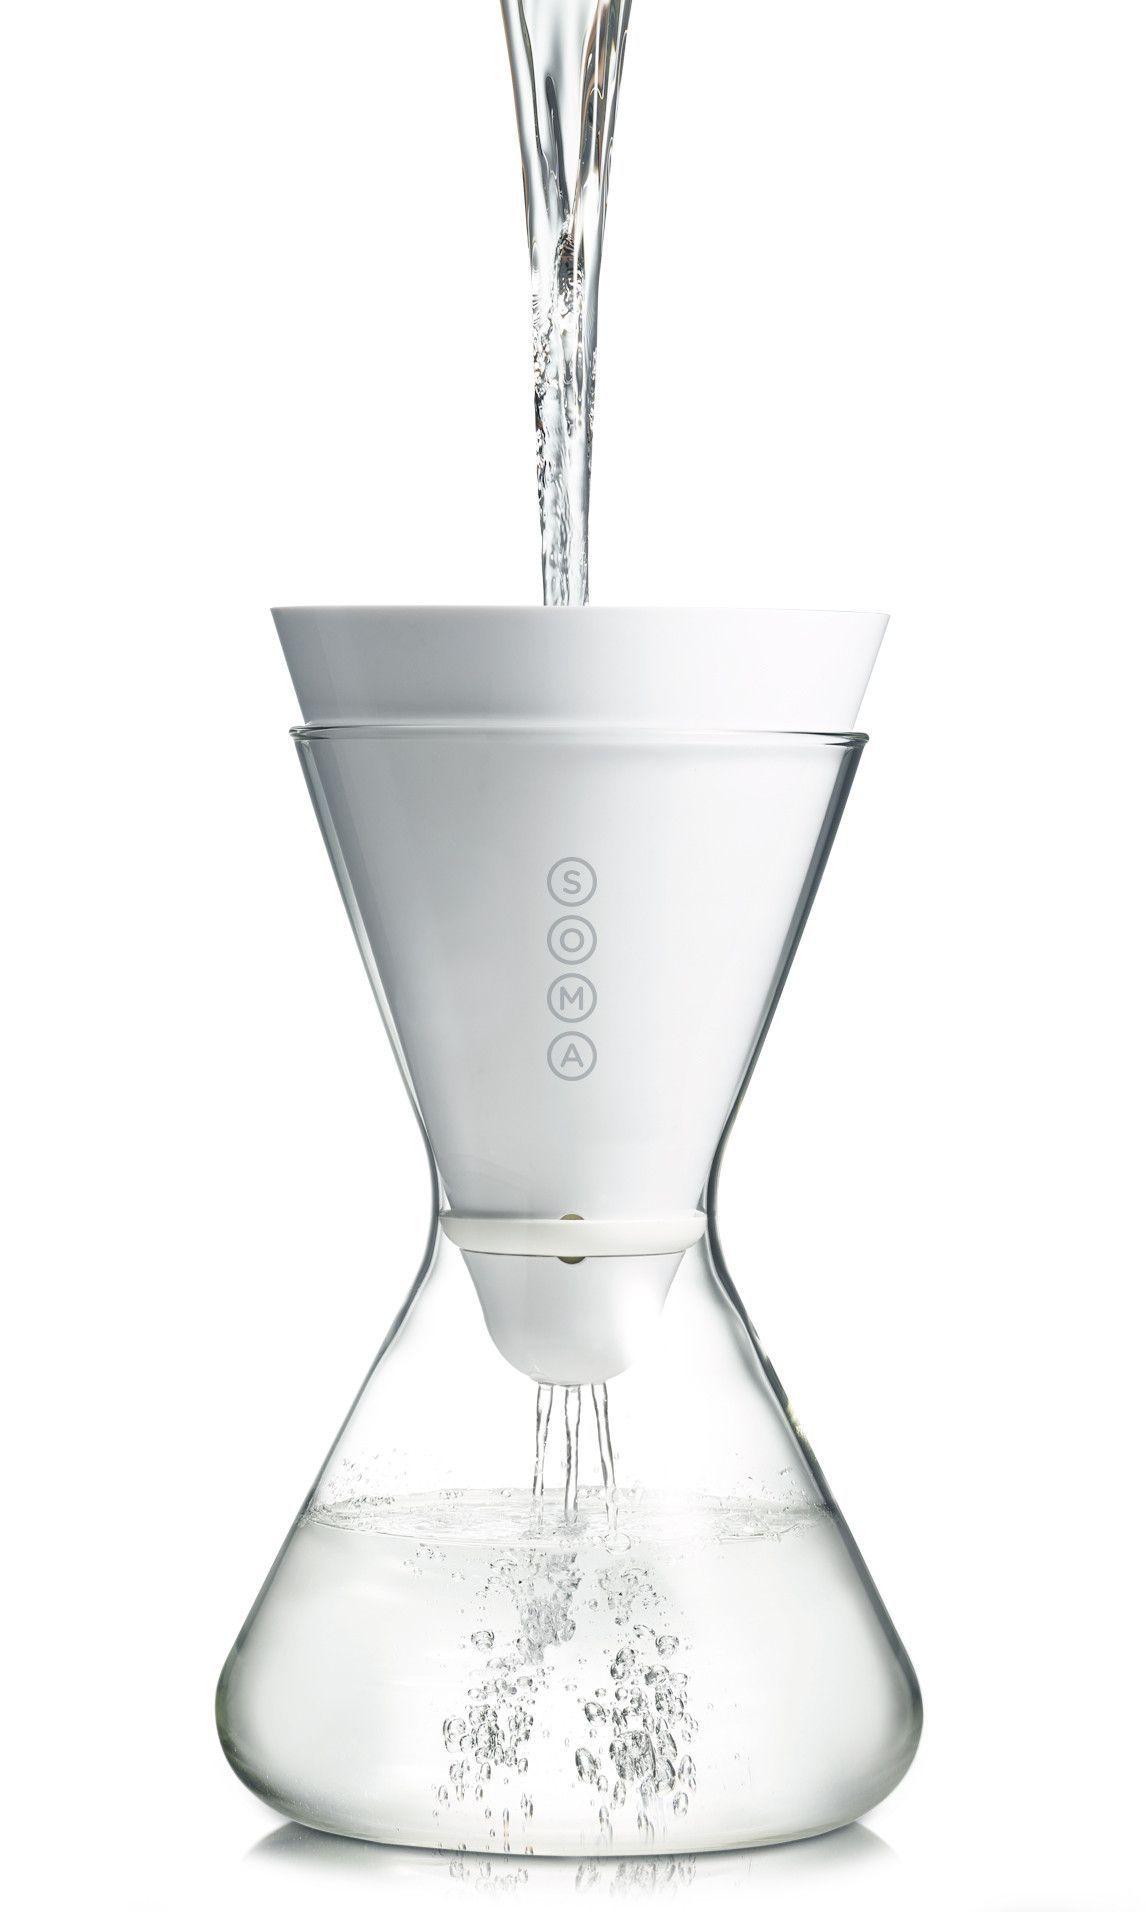 Pyrex Atomic Starburst Glass Carafe Decanter Pitcher by